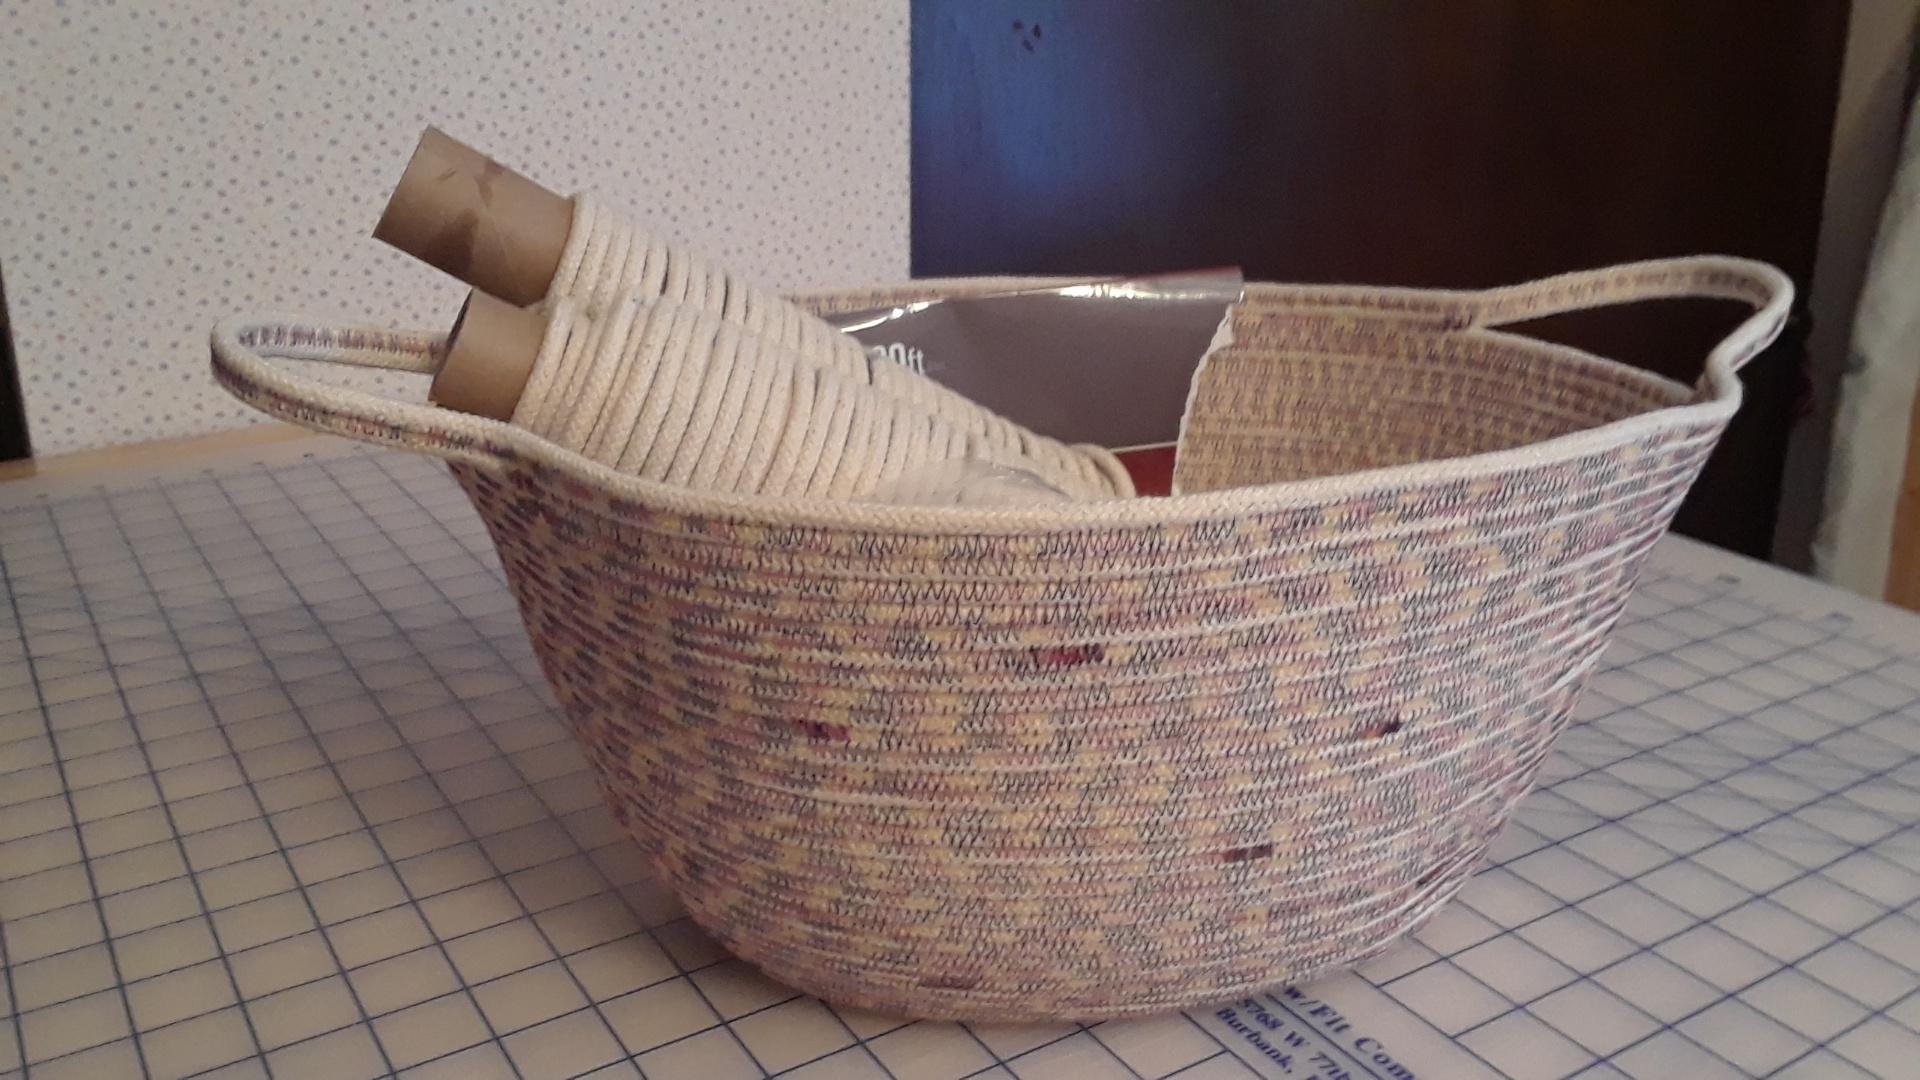 Paulette's basket